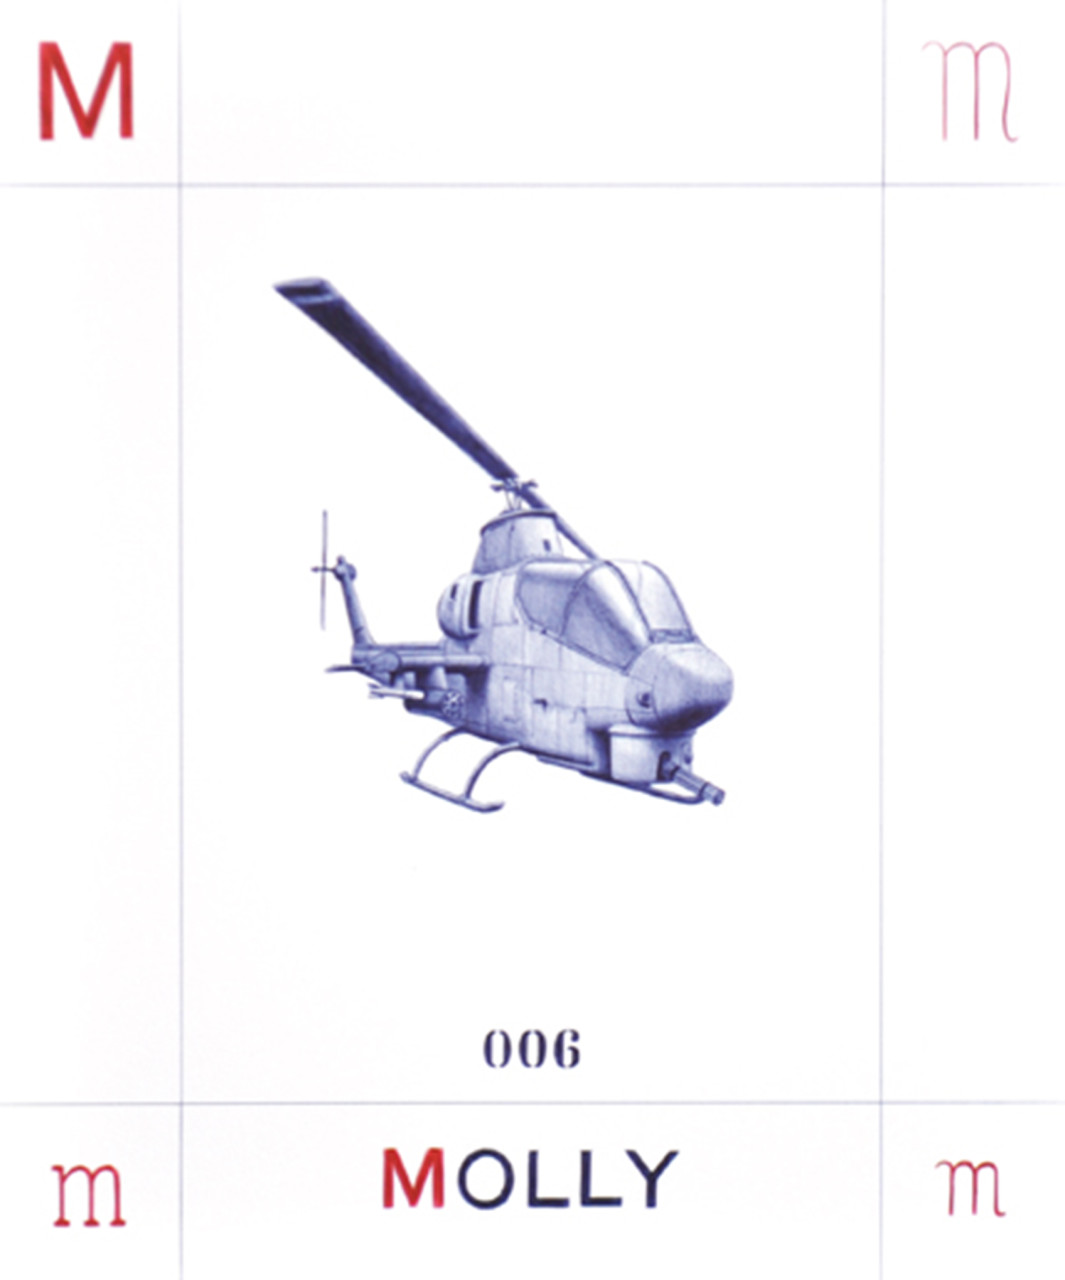 30M-Molly_bassa